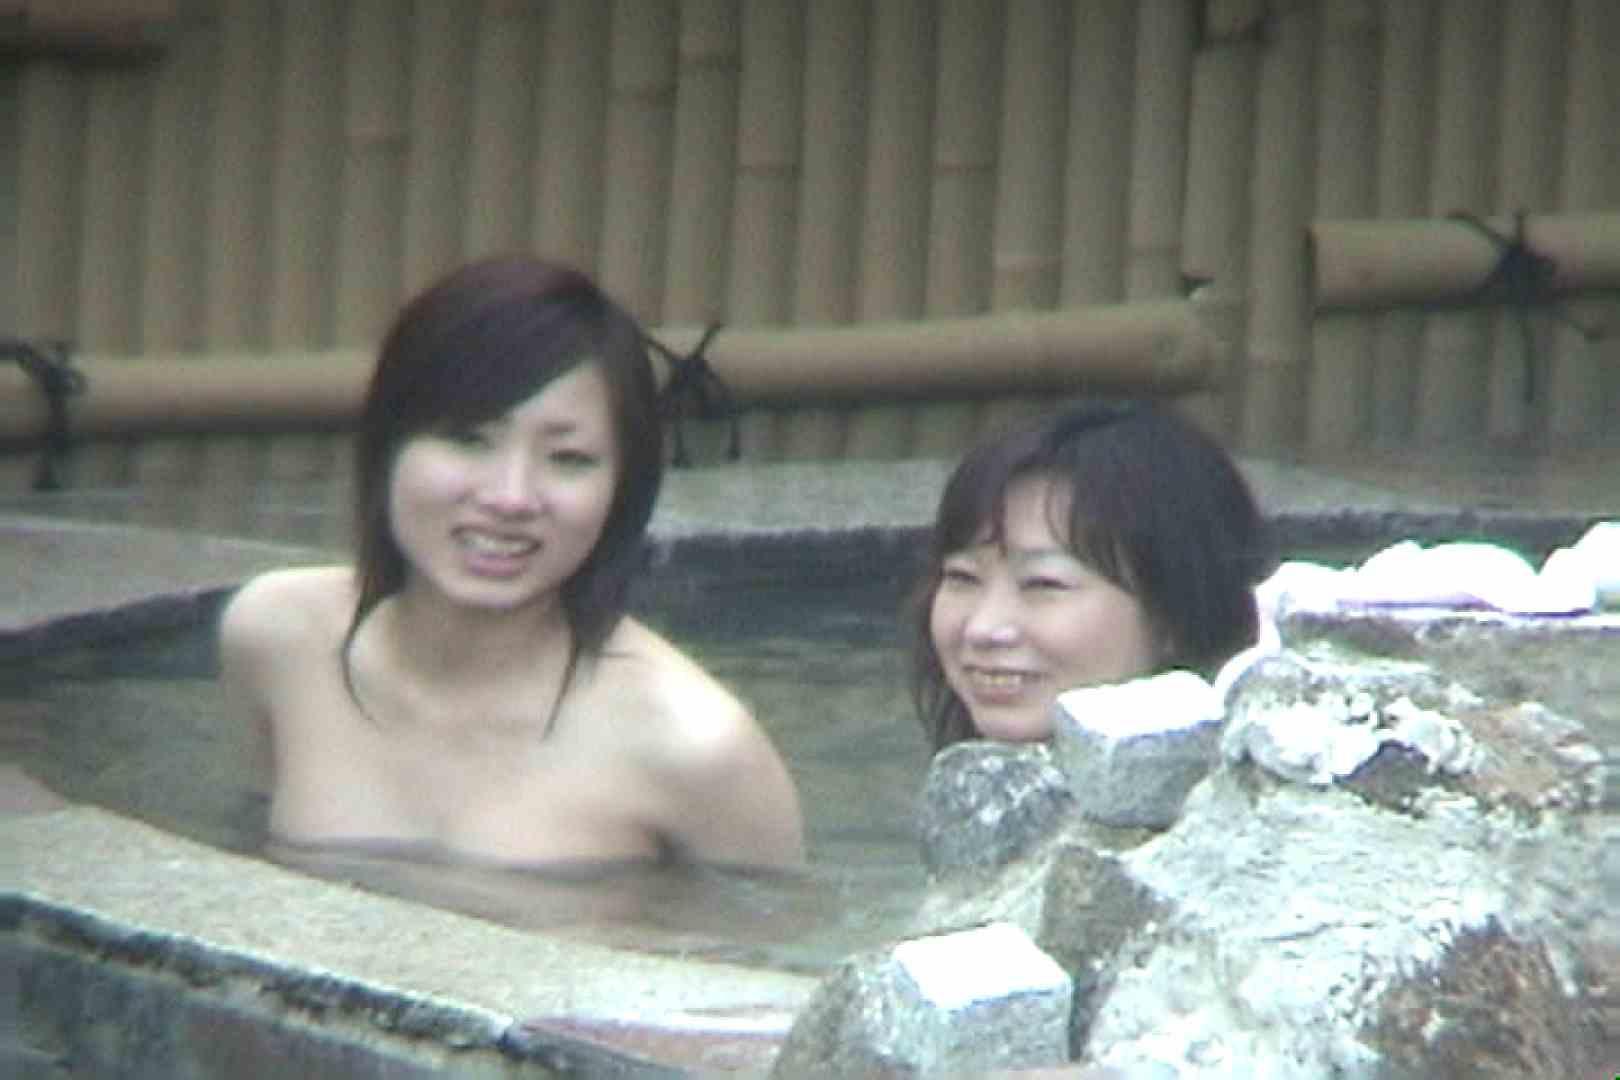 Aquaな露天風呂Vol.58【VIP限定】 HなOL  95pic 40